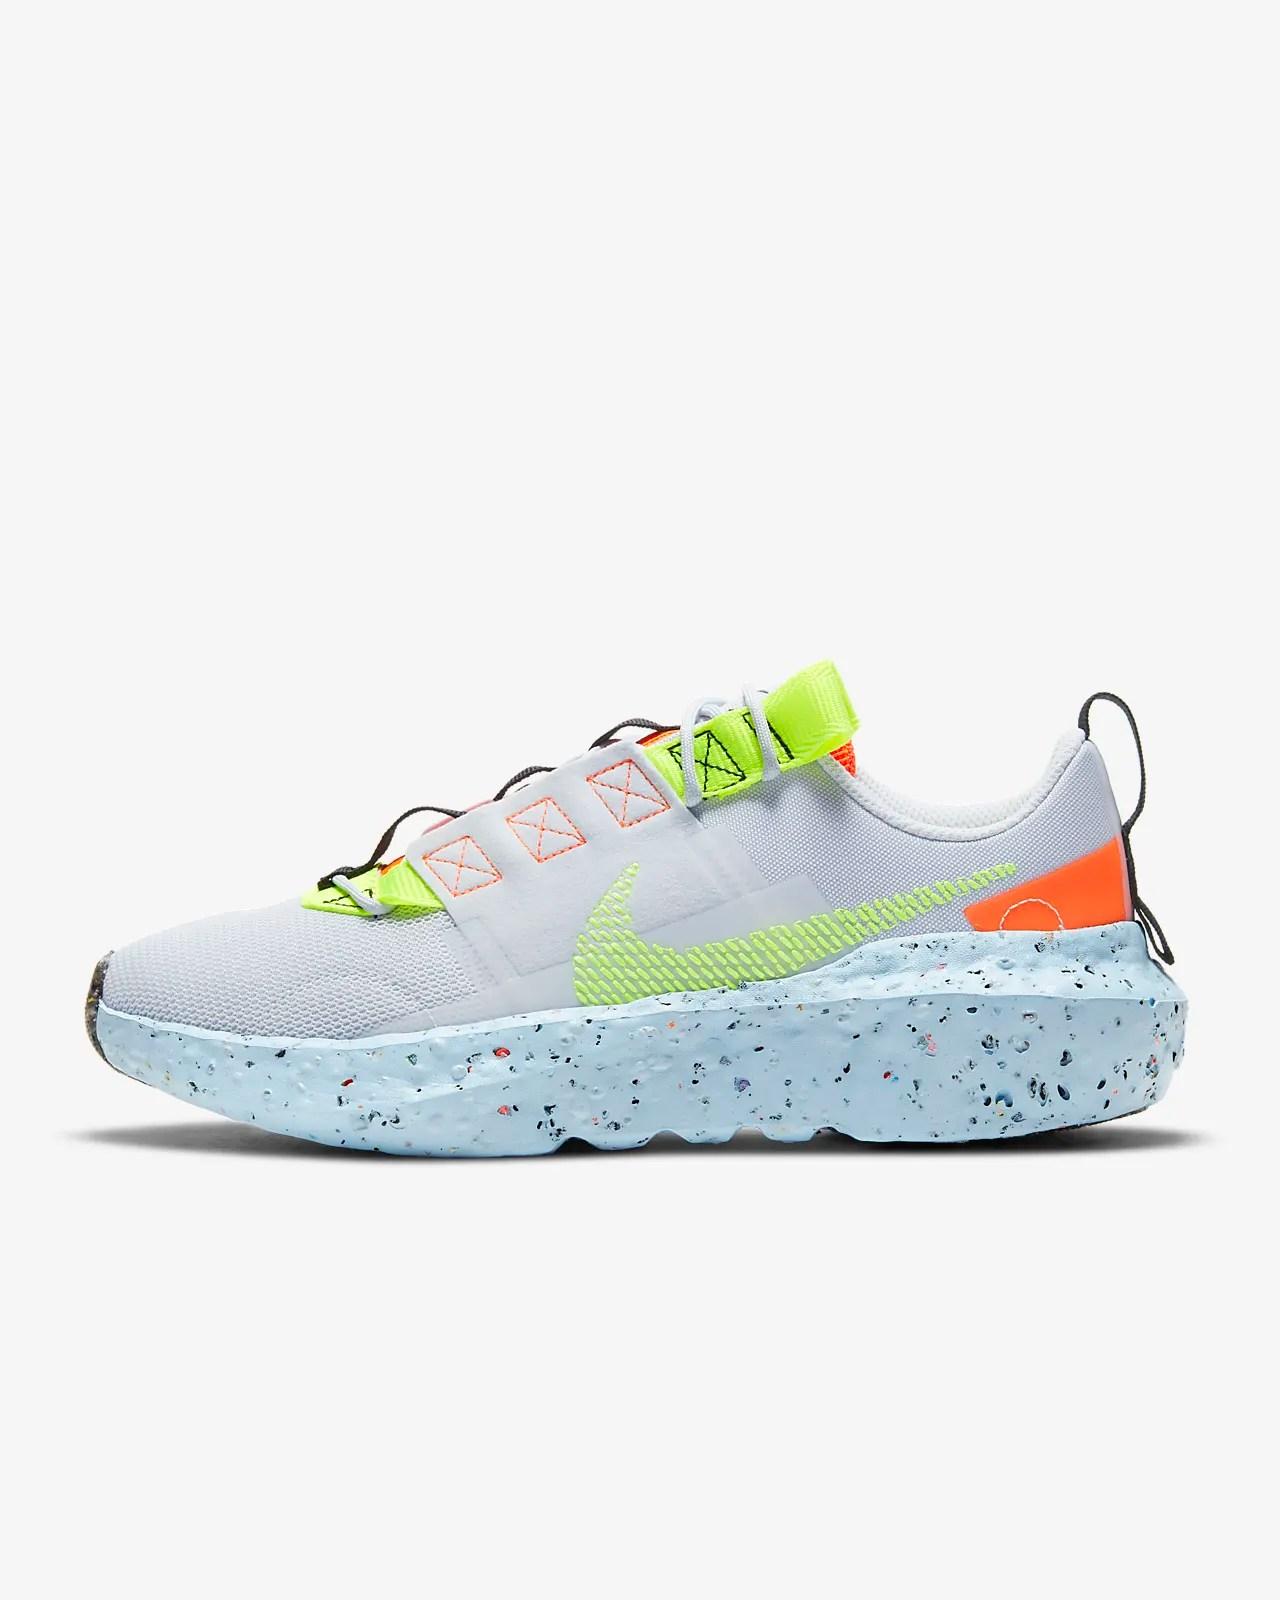 Women's Nike Crater Impact